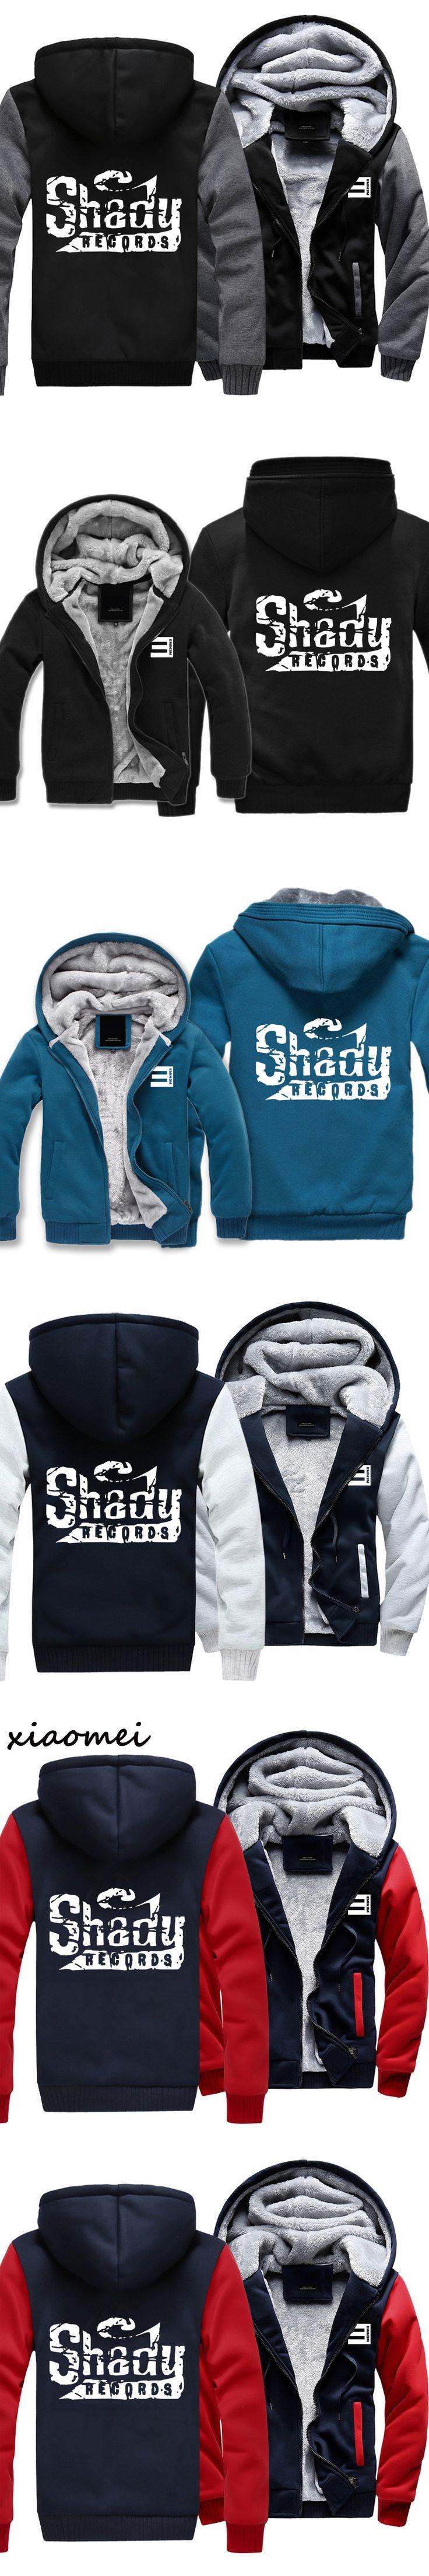 2017 New Men Hoodies Autumn Winter  Eminem Rap Hoody Fleece Hip Hop Sweatshirt Casual  Sudaderas Hombre  Cardigan